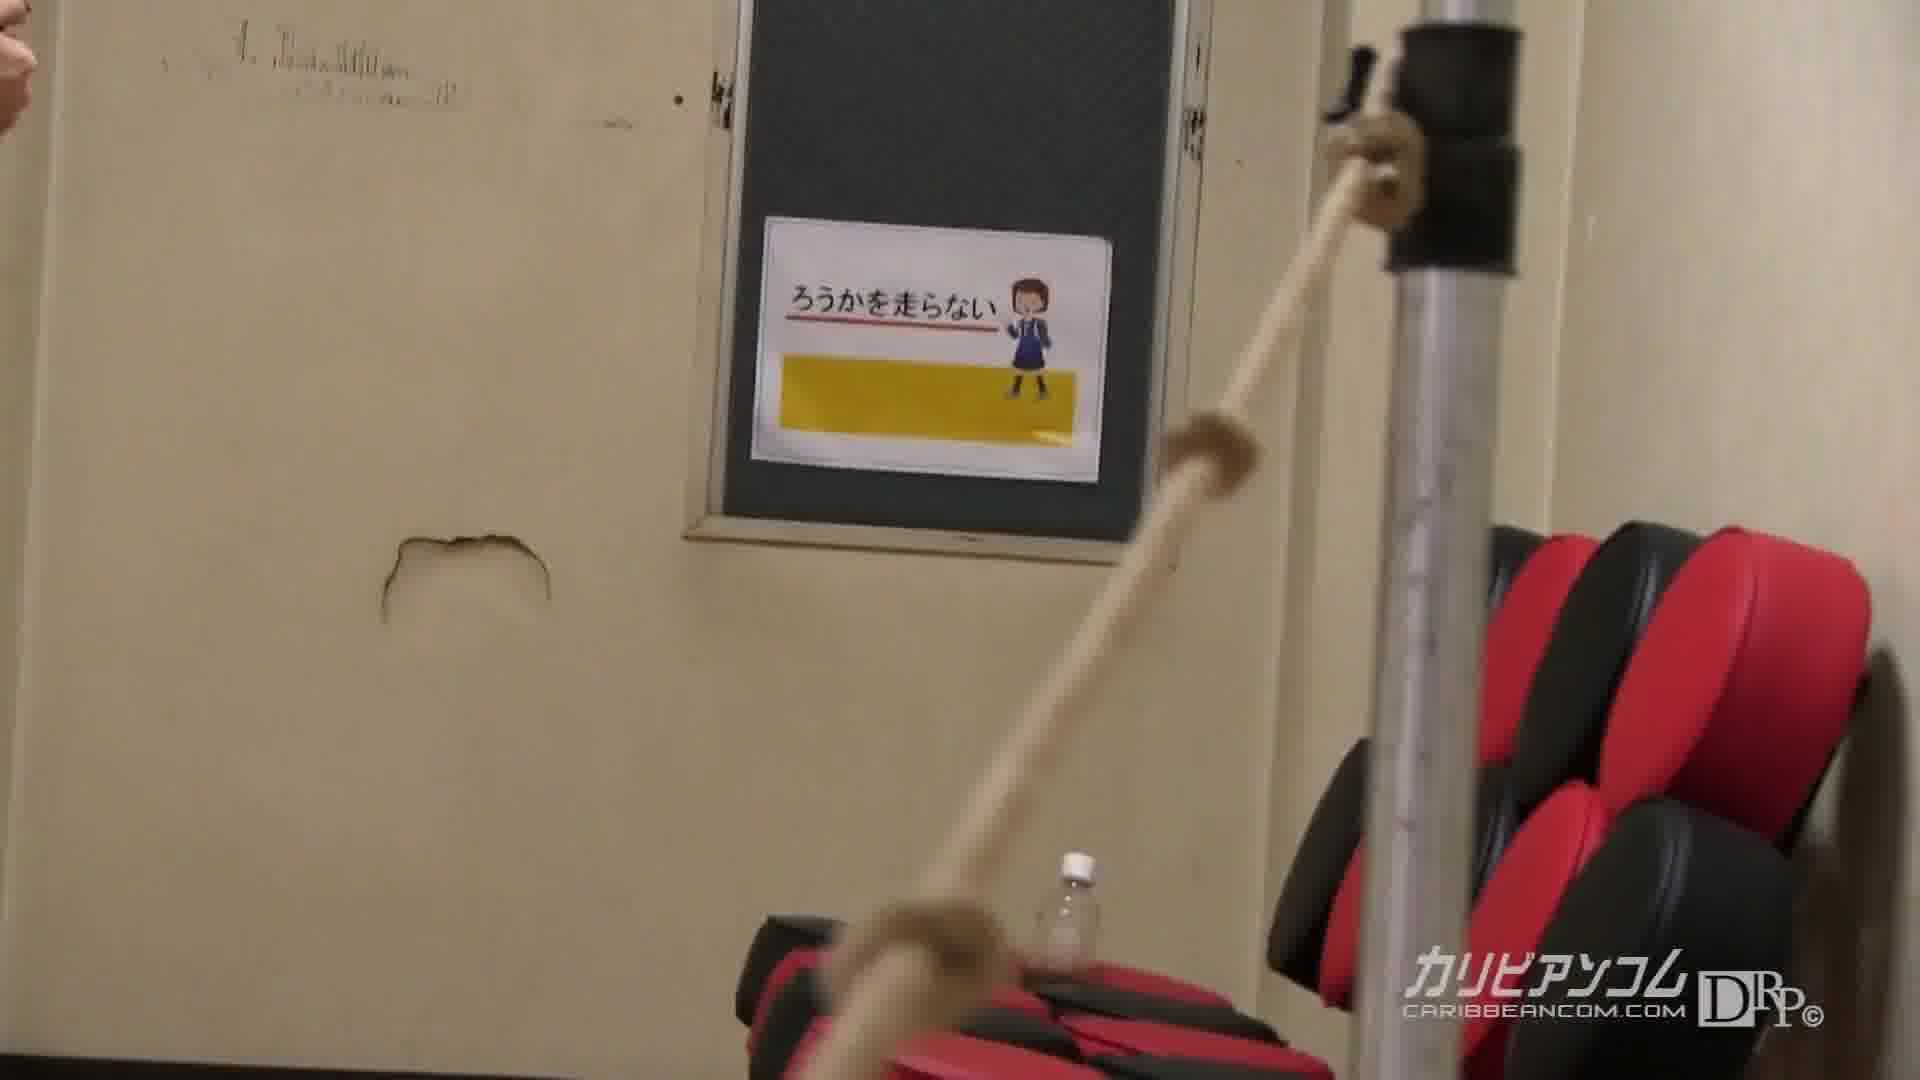 THE 未公開 ~恥じらいのお漏らし大作戦~ - 葉山瞳【スレンダー・美乳・放尿】